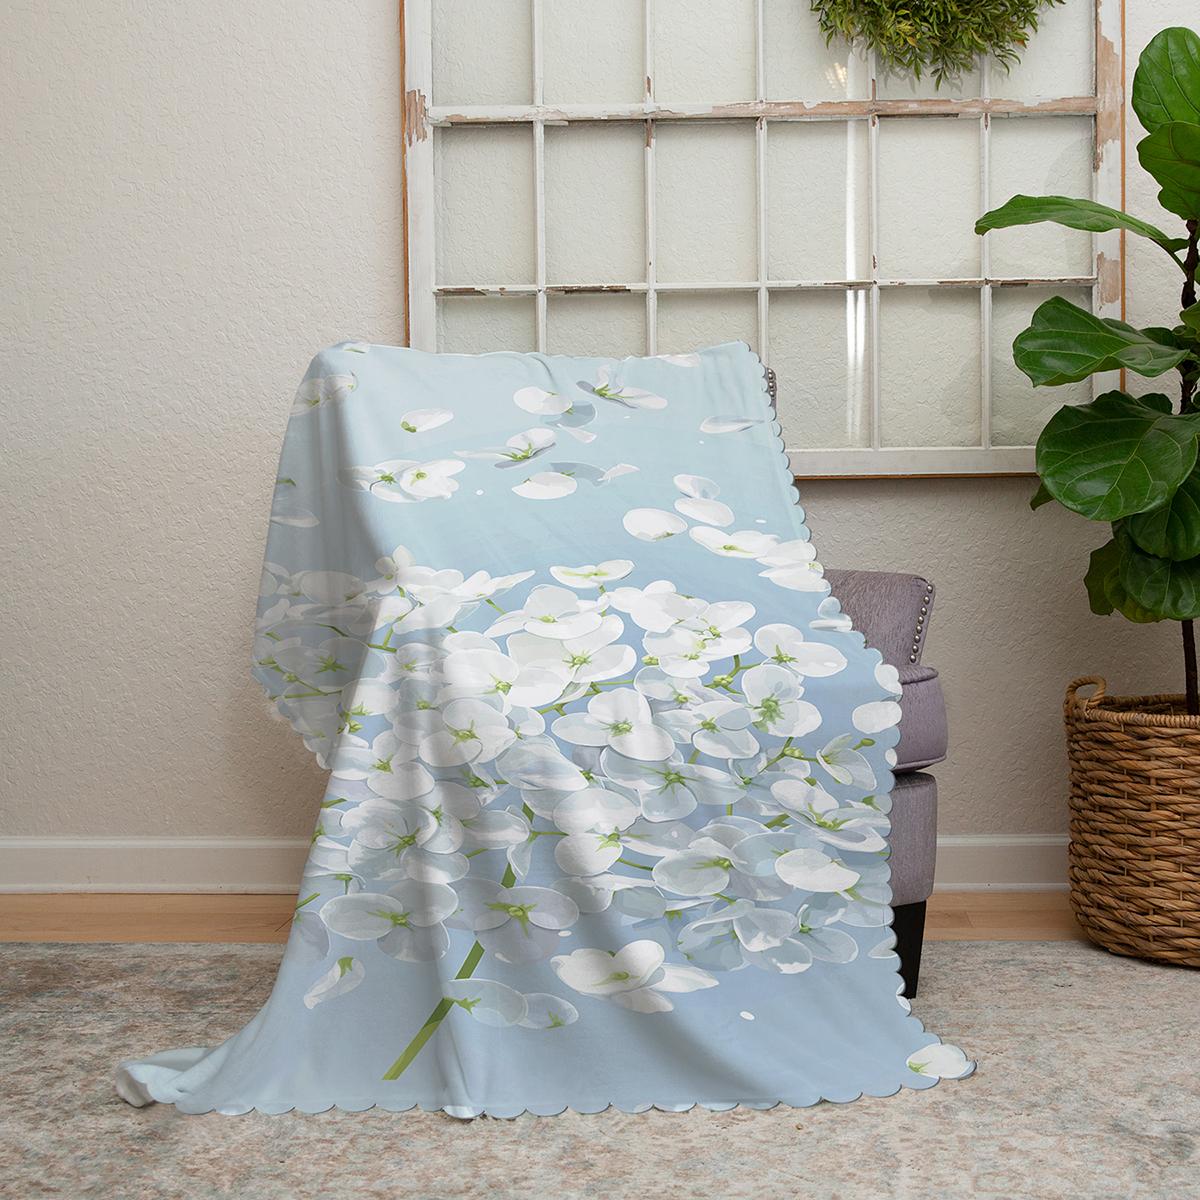 Realhomes Mavi Zeminde Beyaz Ortanca Çiçeği Baskılı Şönil Koltuk Örtüsü Realhomes